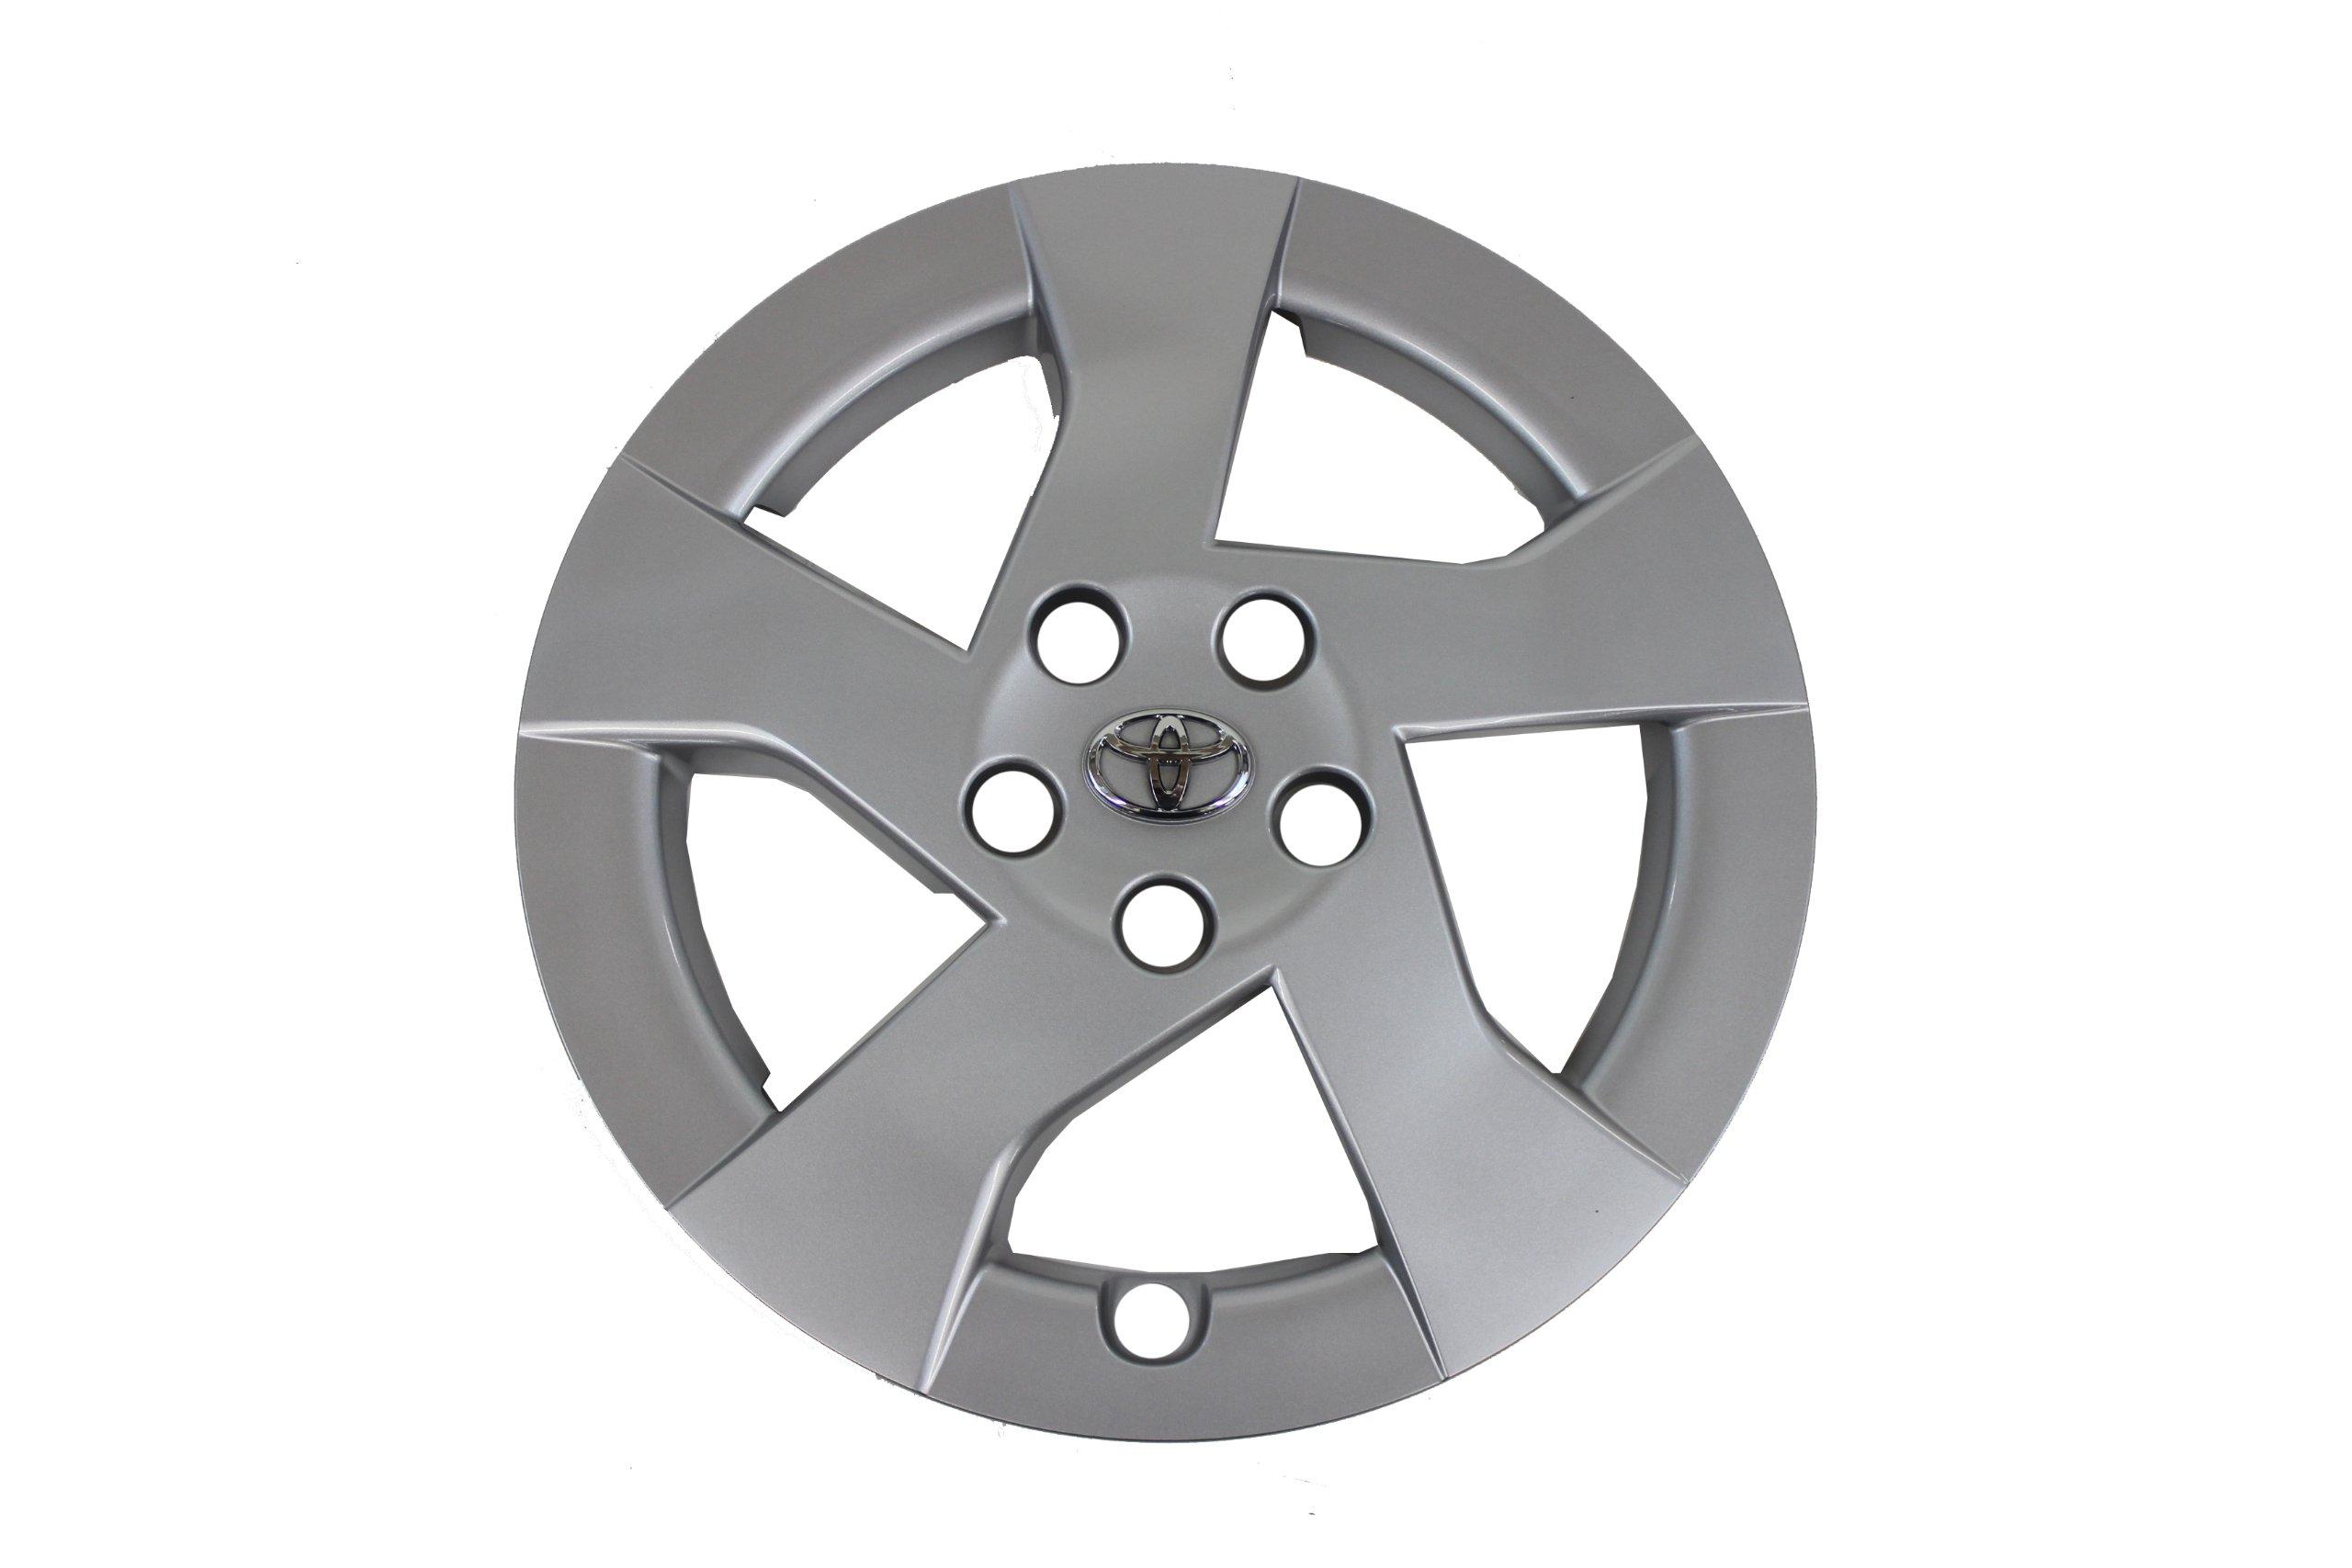 Genuine Toyota Parts 42602-47110 Hubcap